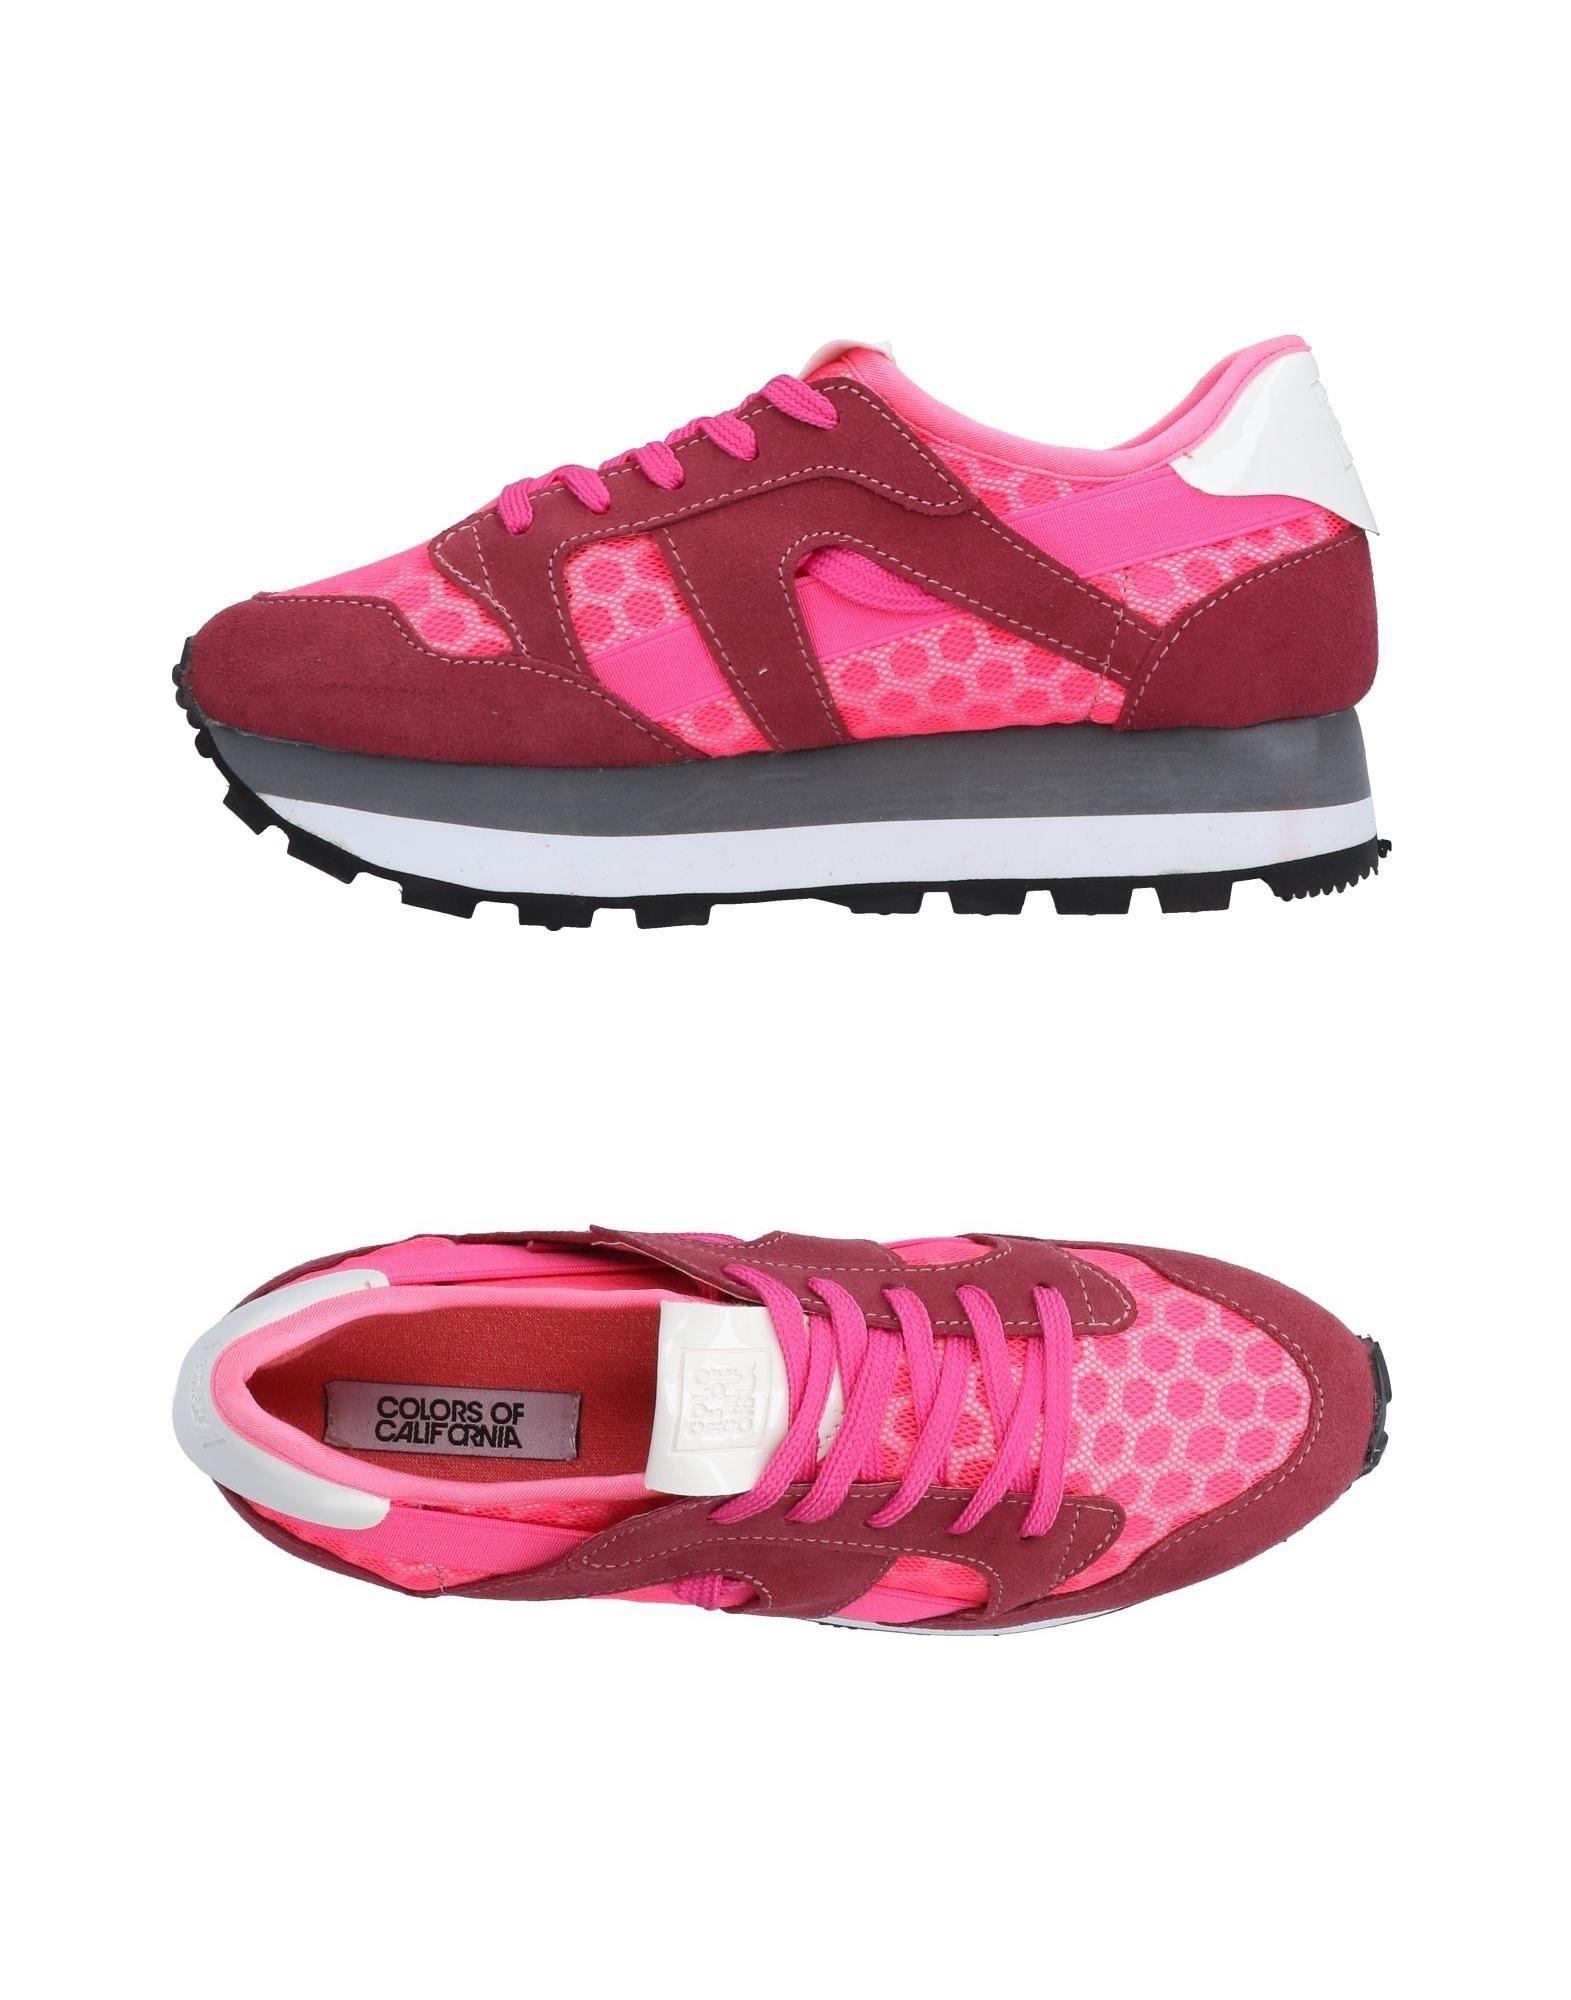 Colors Of California Sneakers Damen  11504247QT Gute Qualität beliebte Schuhe